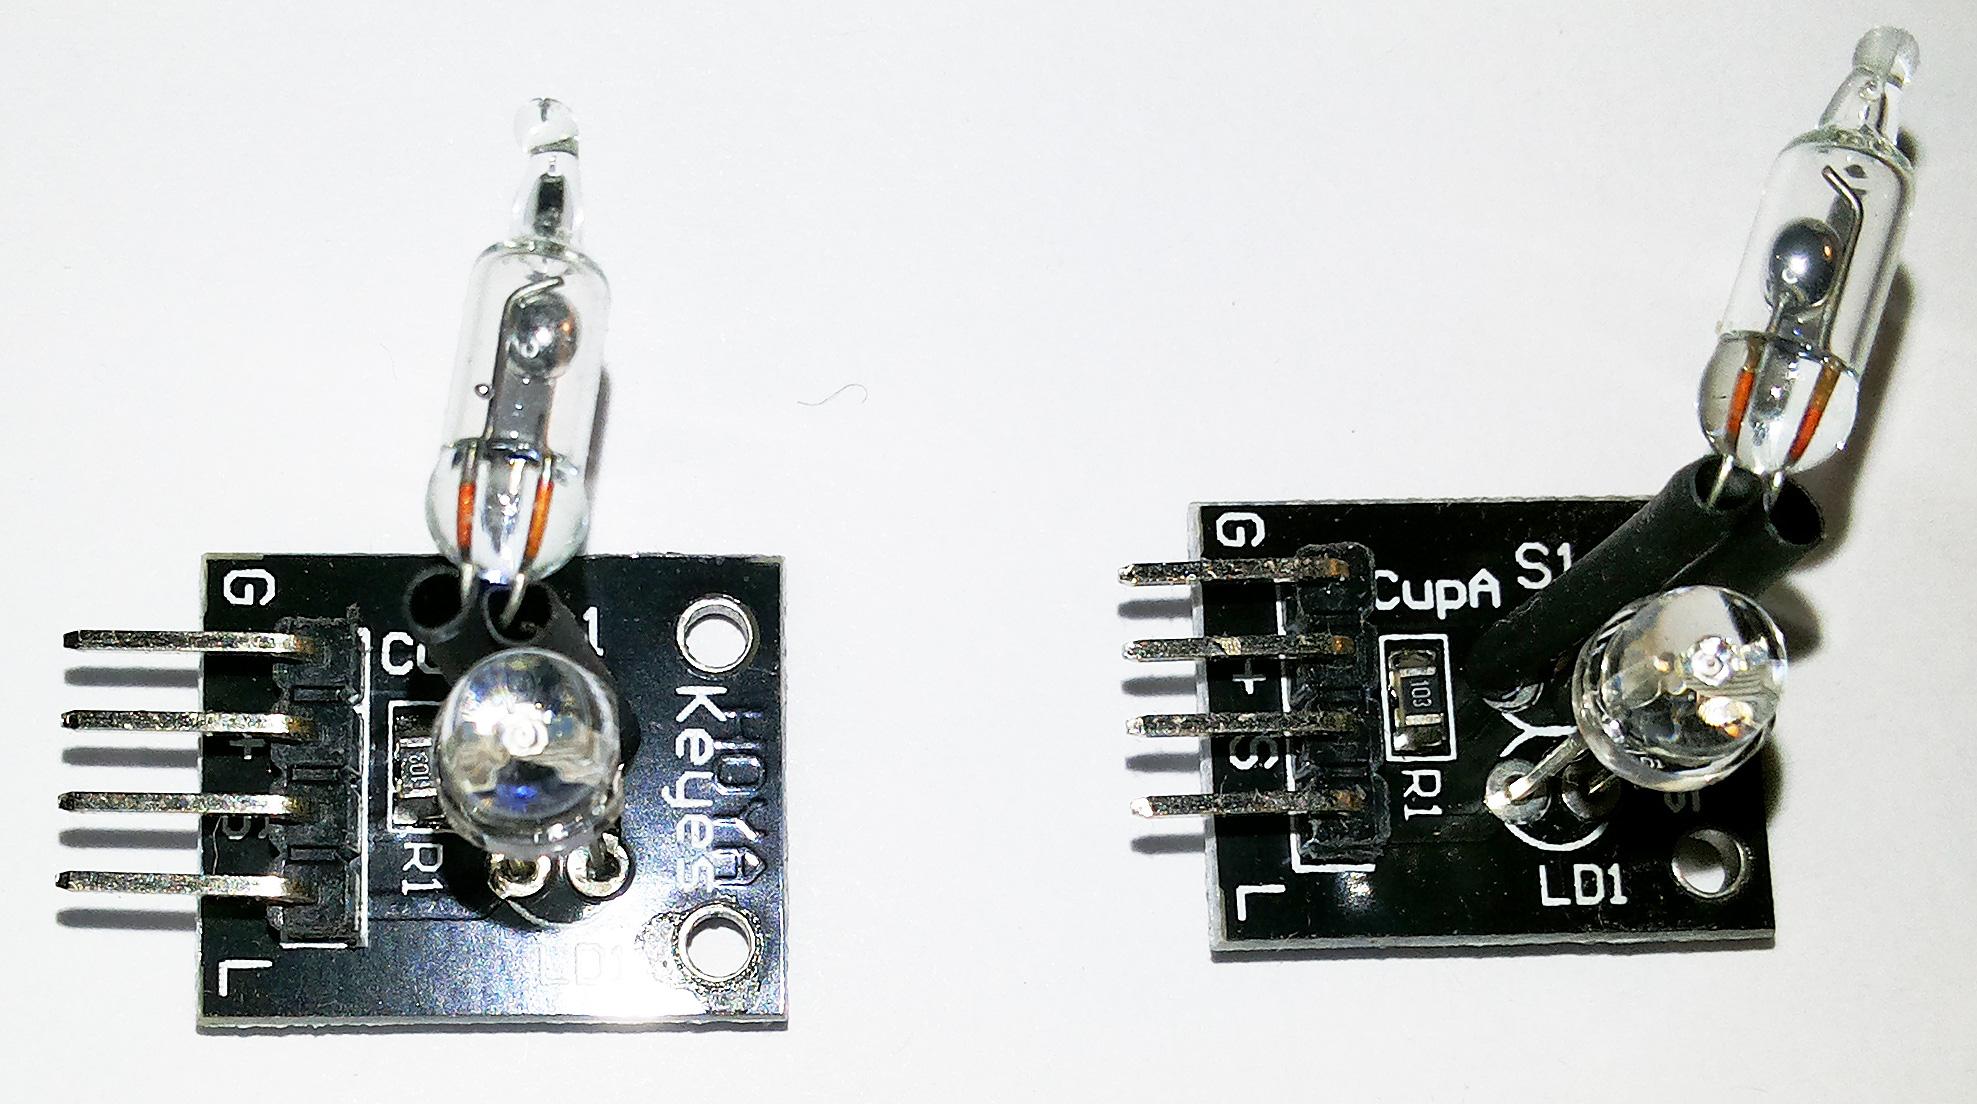 KY-027 - датчик наклона со светодиодом для ARDUINO